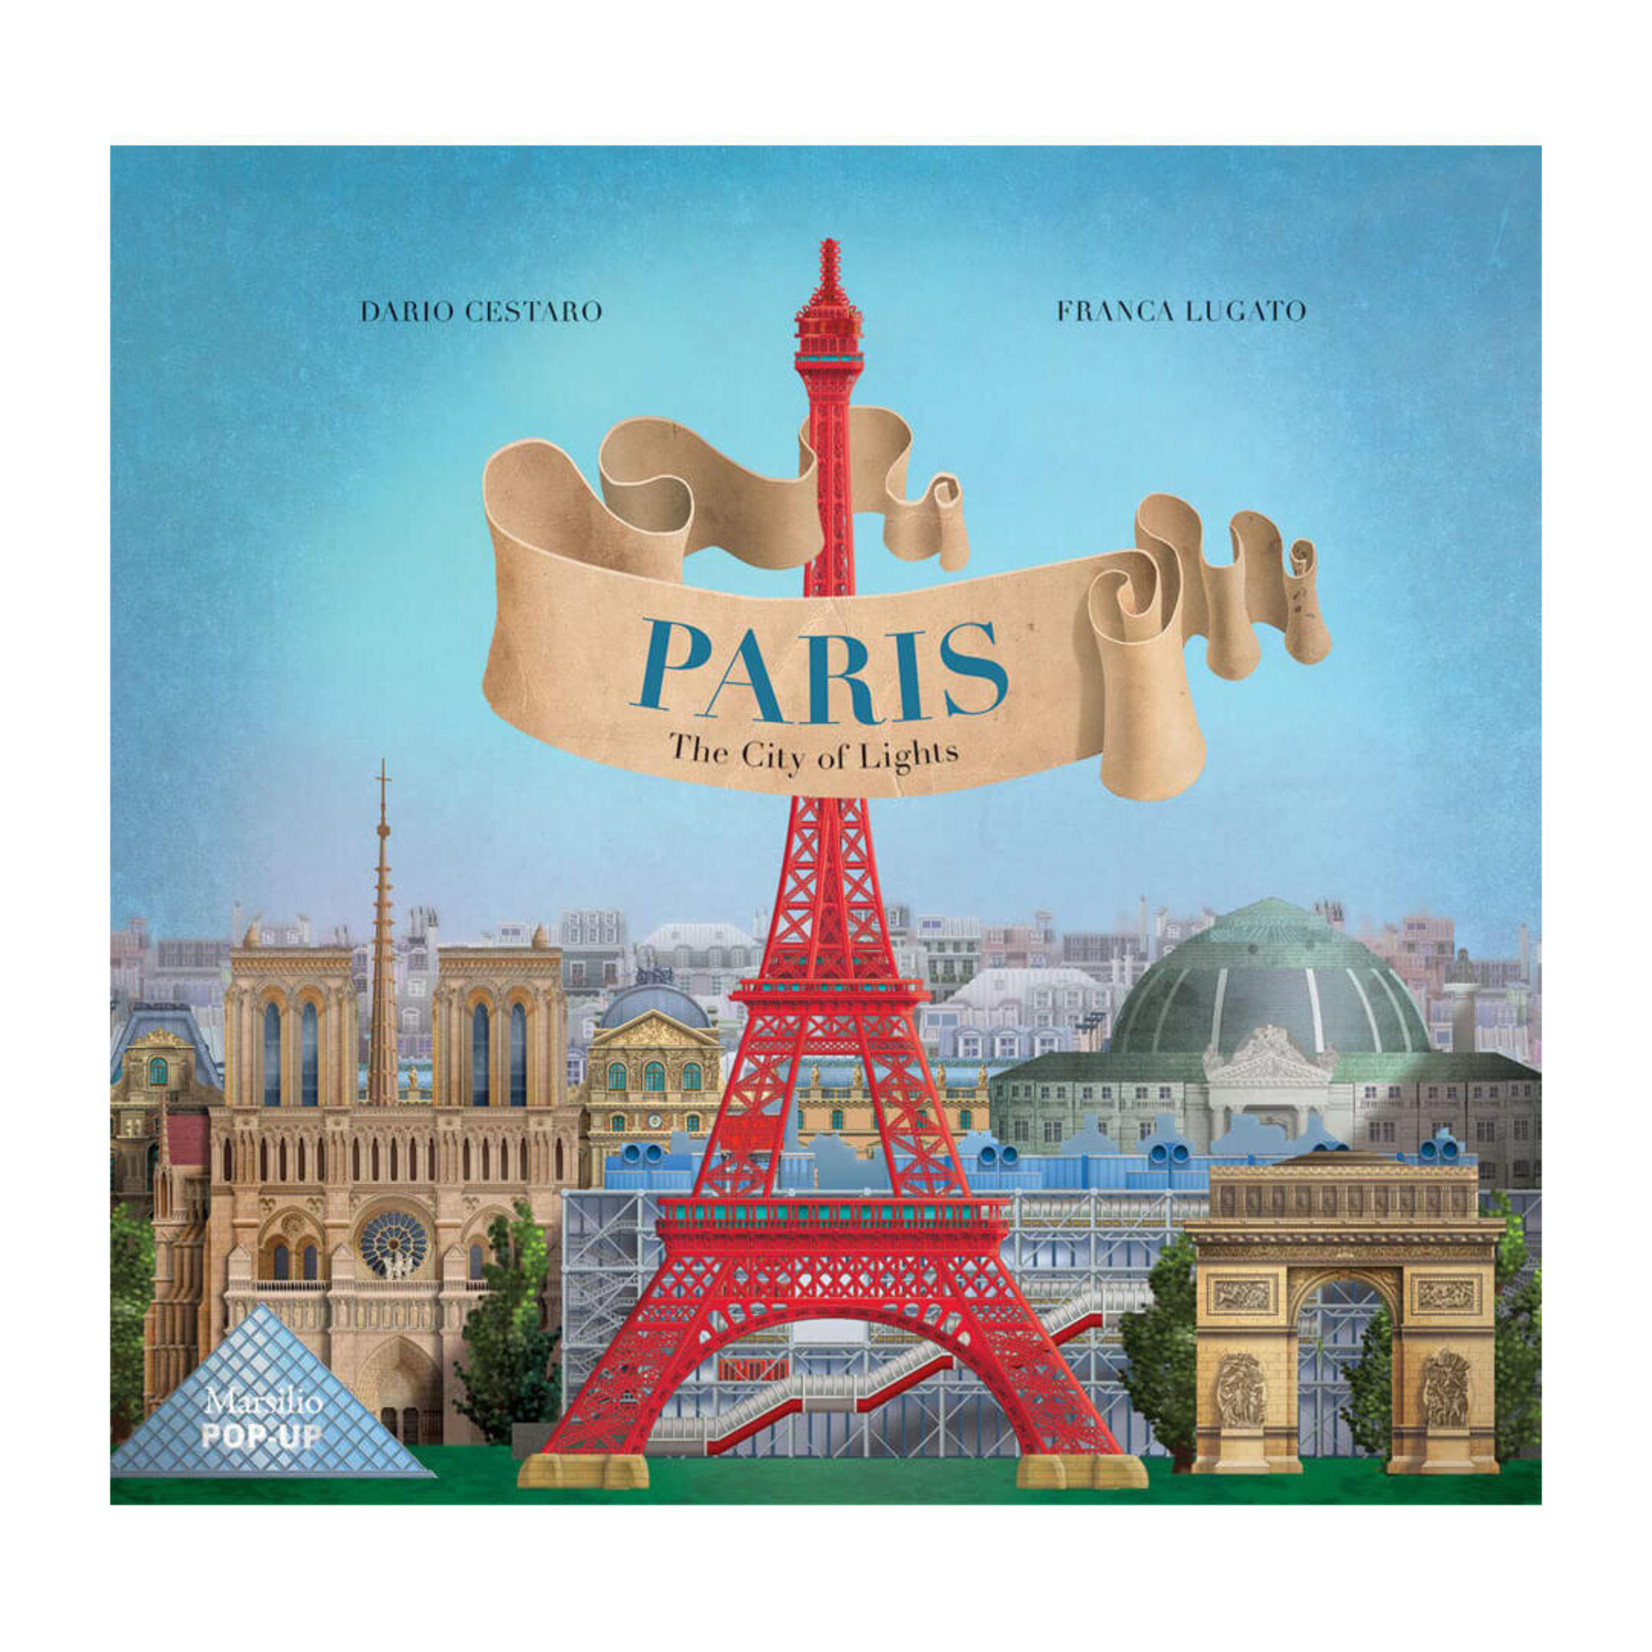 Paris: The City of Lights — Pop-up Book